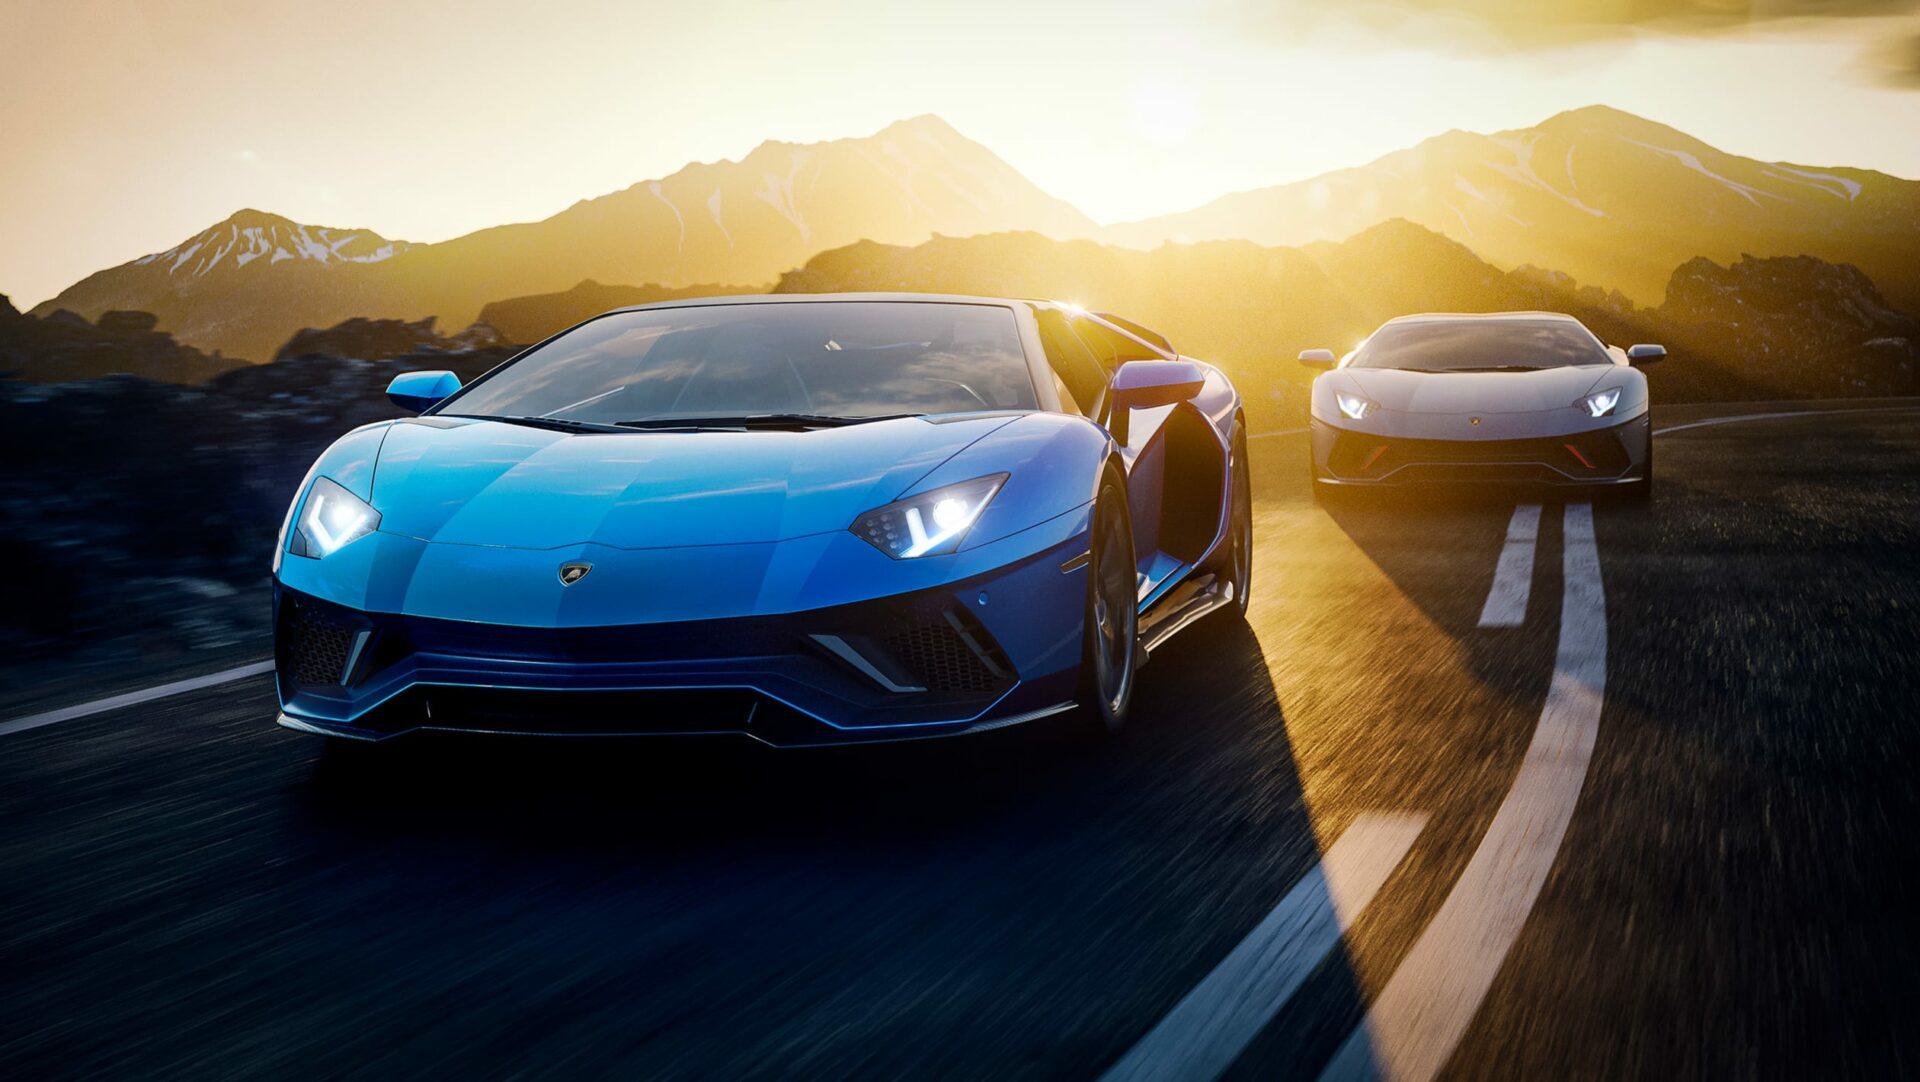 Fotos: Lamborghini Aventador LP780-4 Ultimae